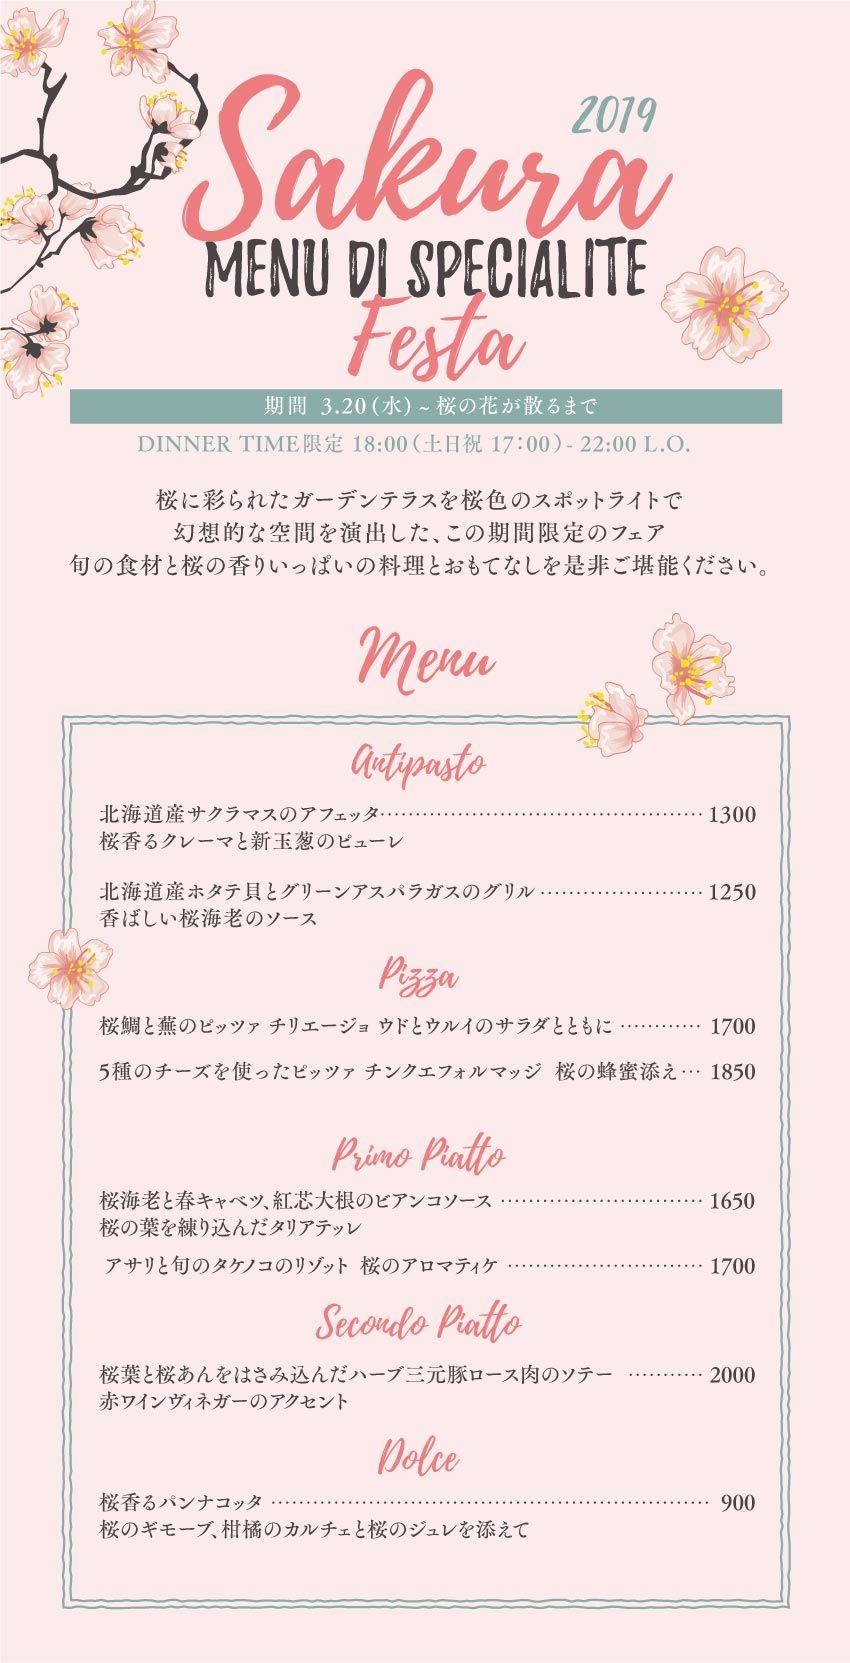 aoi_1903_sakura_menu_1.jpg